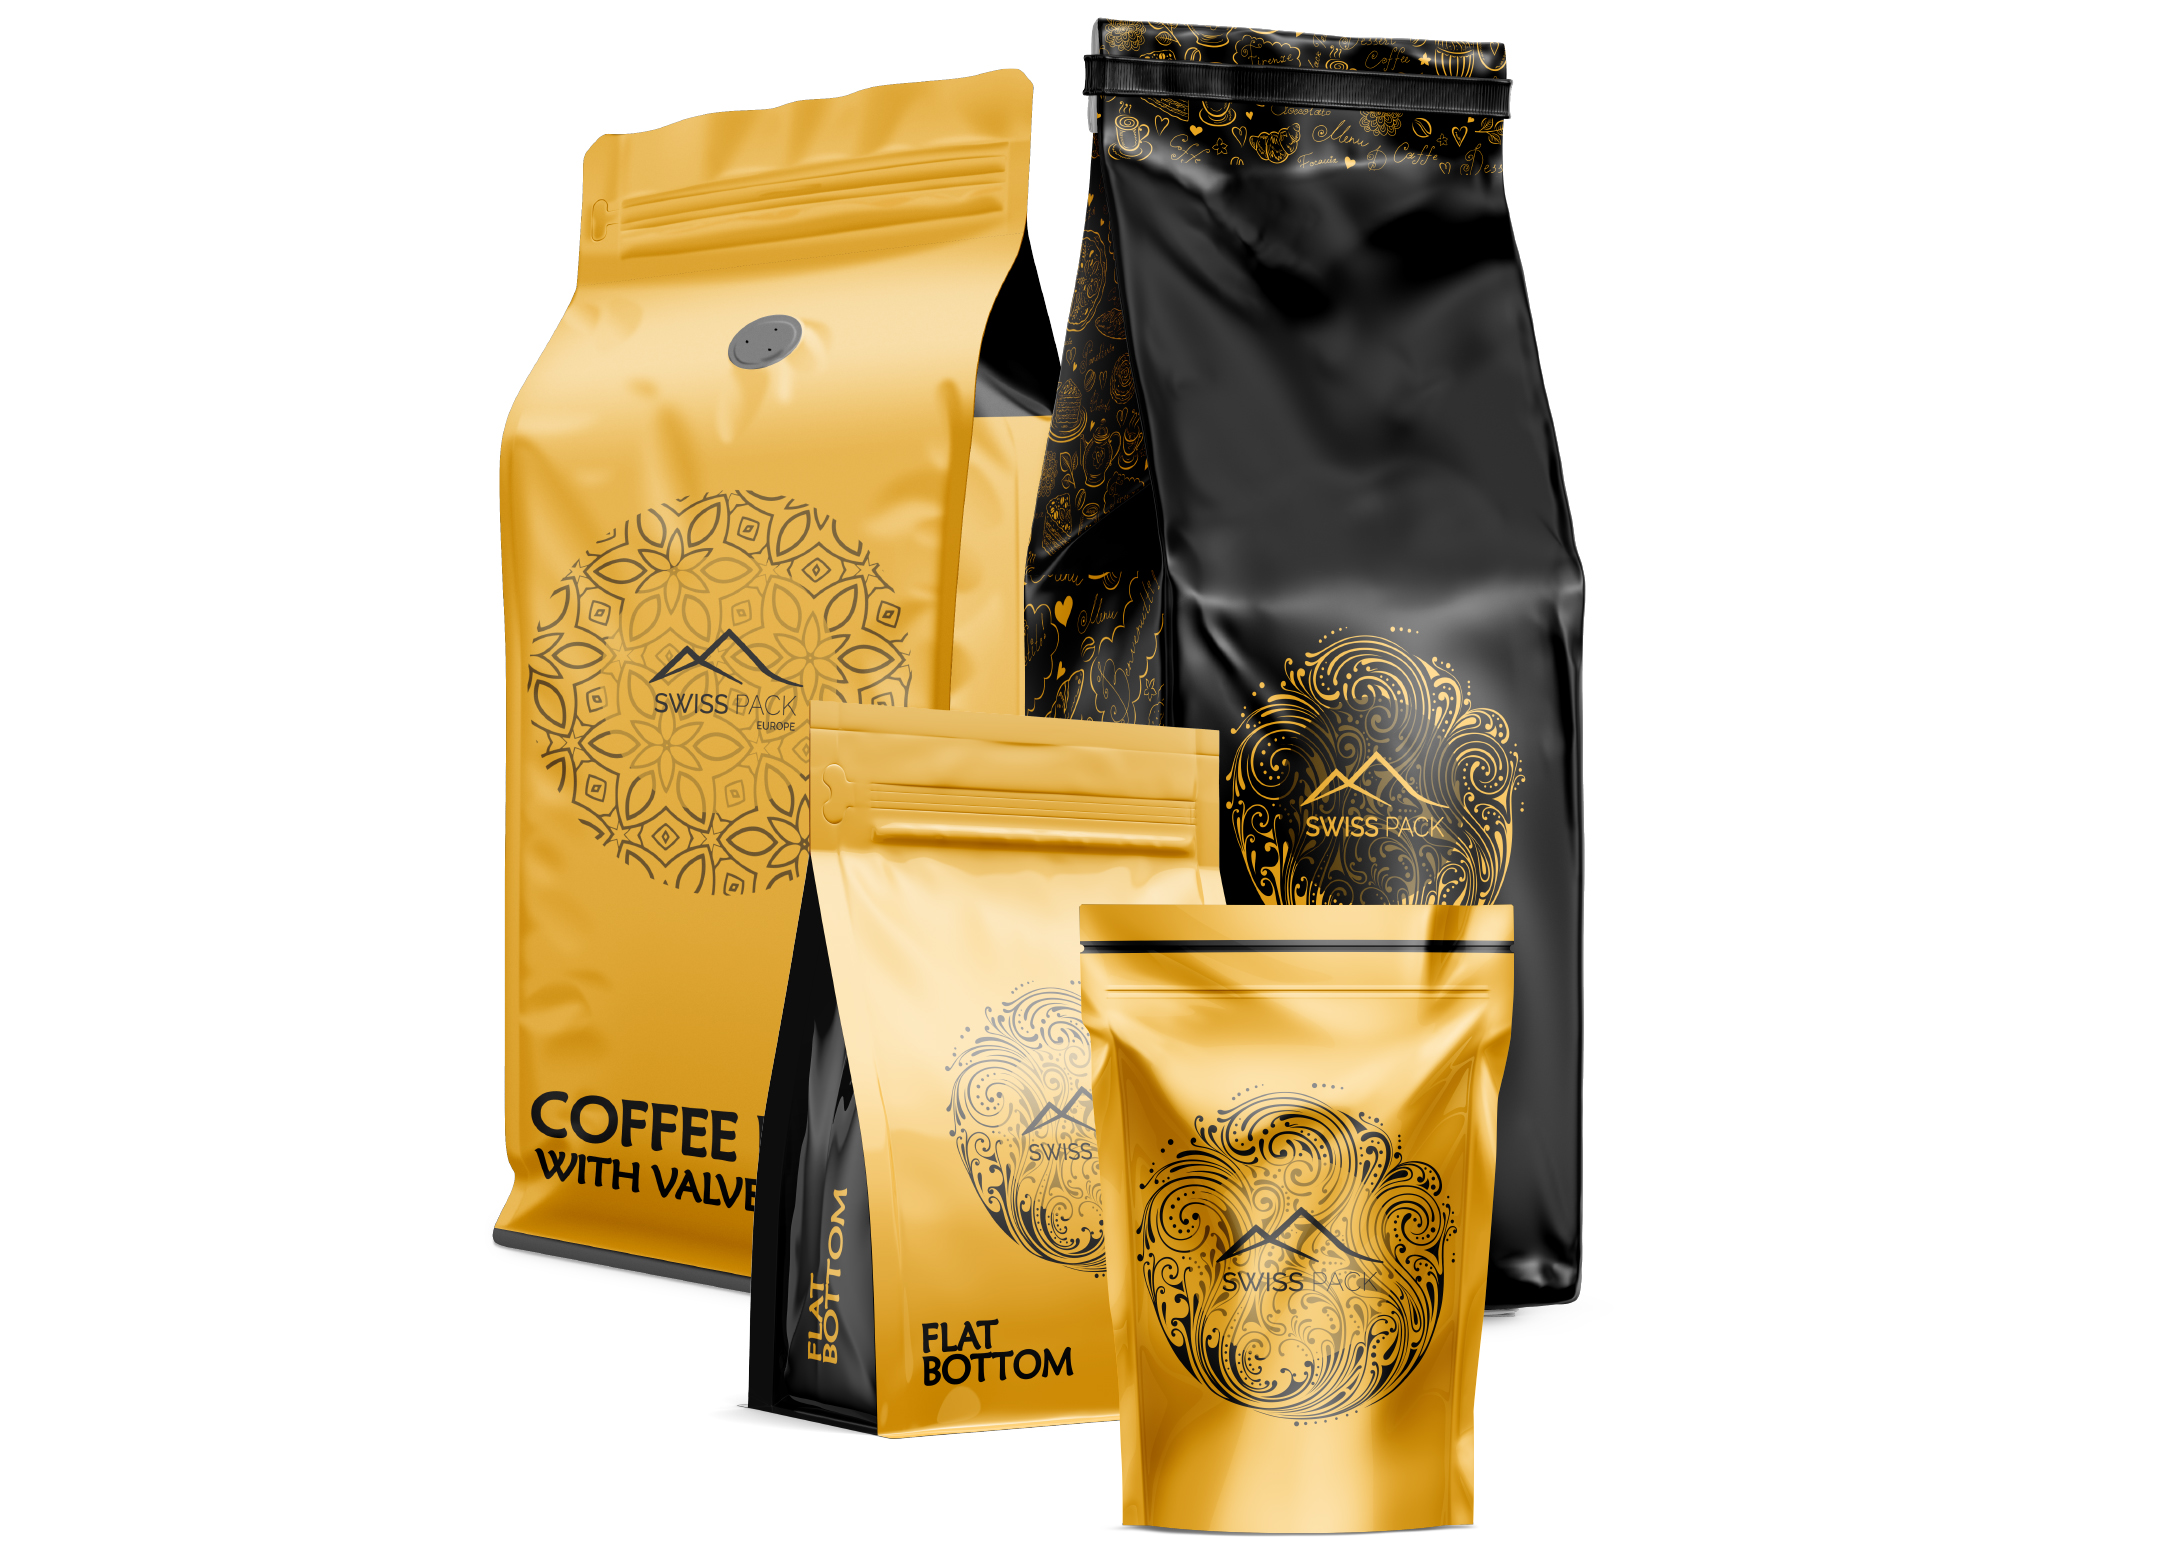 Coffee-category-photo-3.jpg